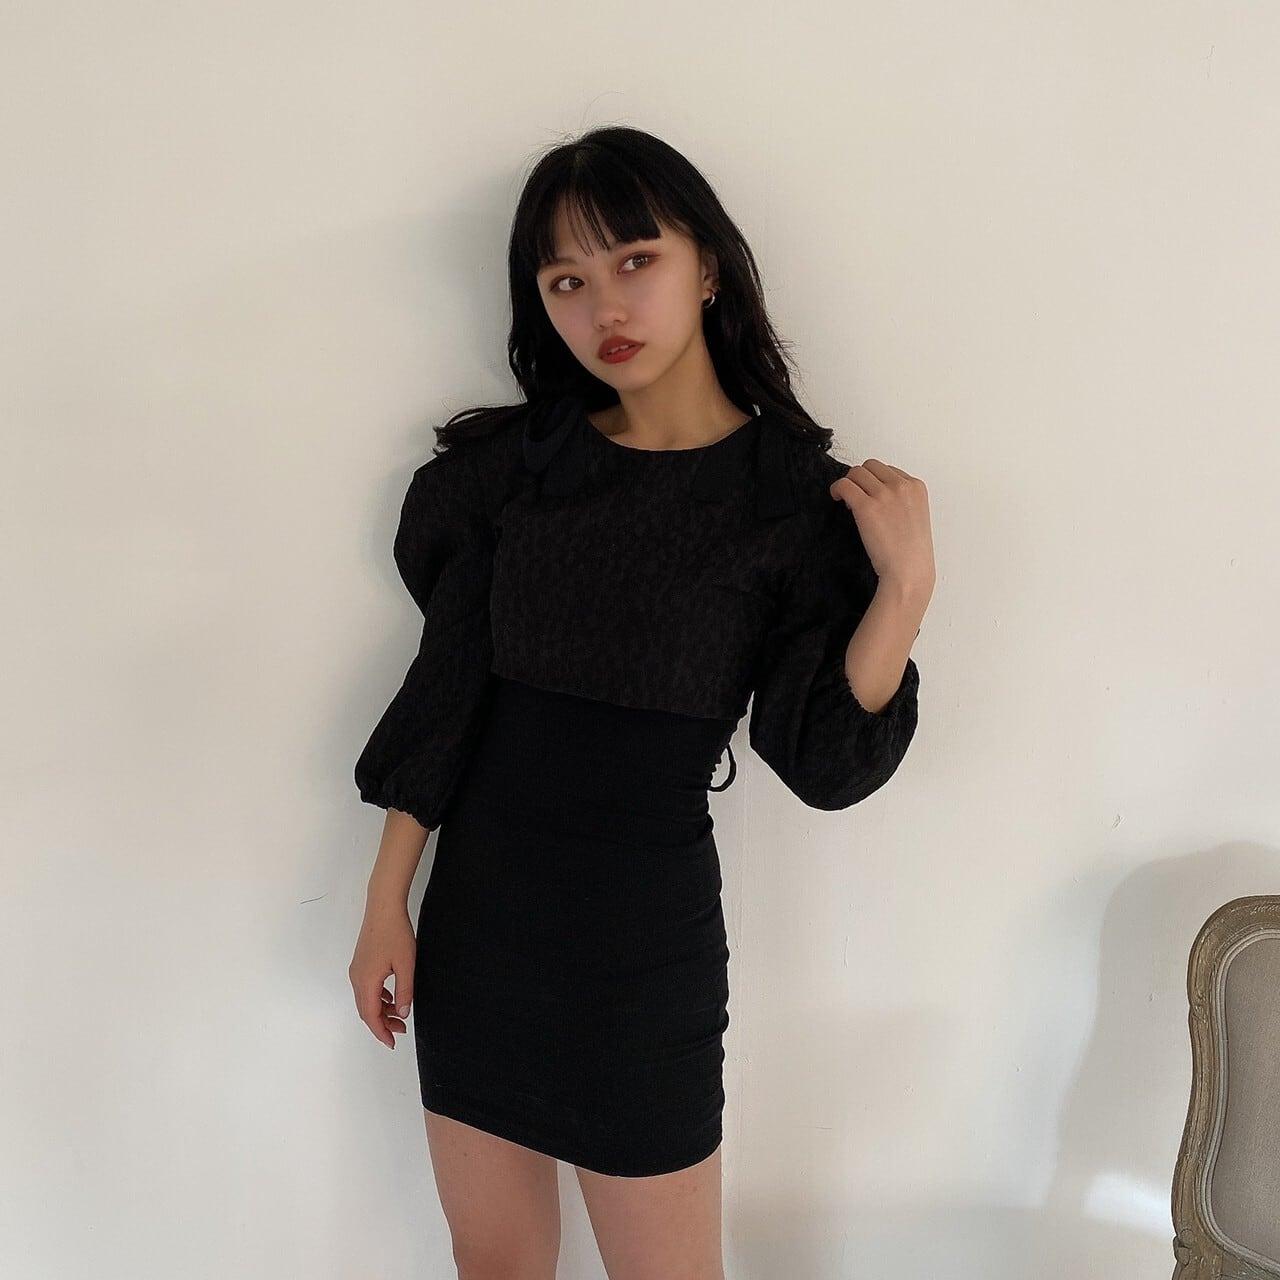 【Belle】 ribbon camisole onepiece / black